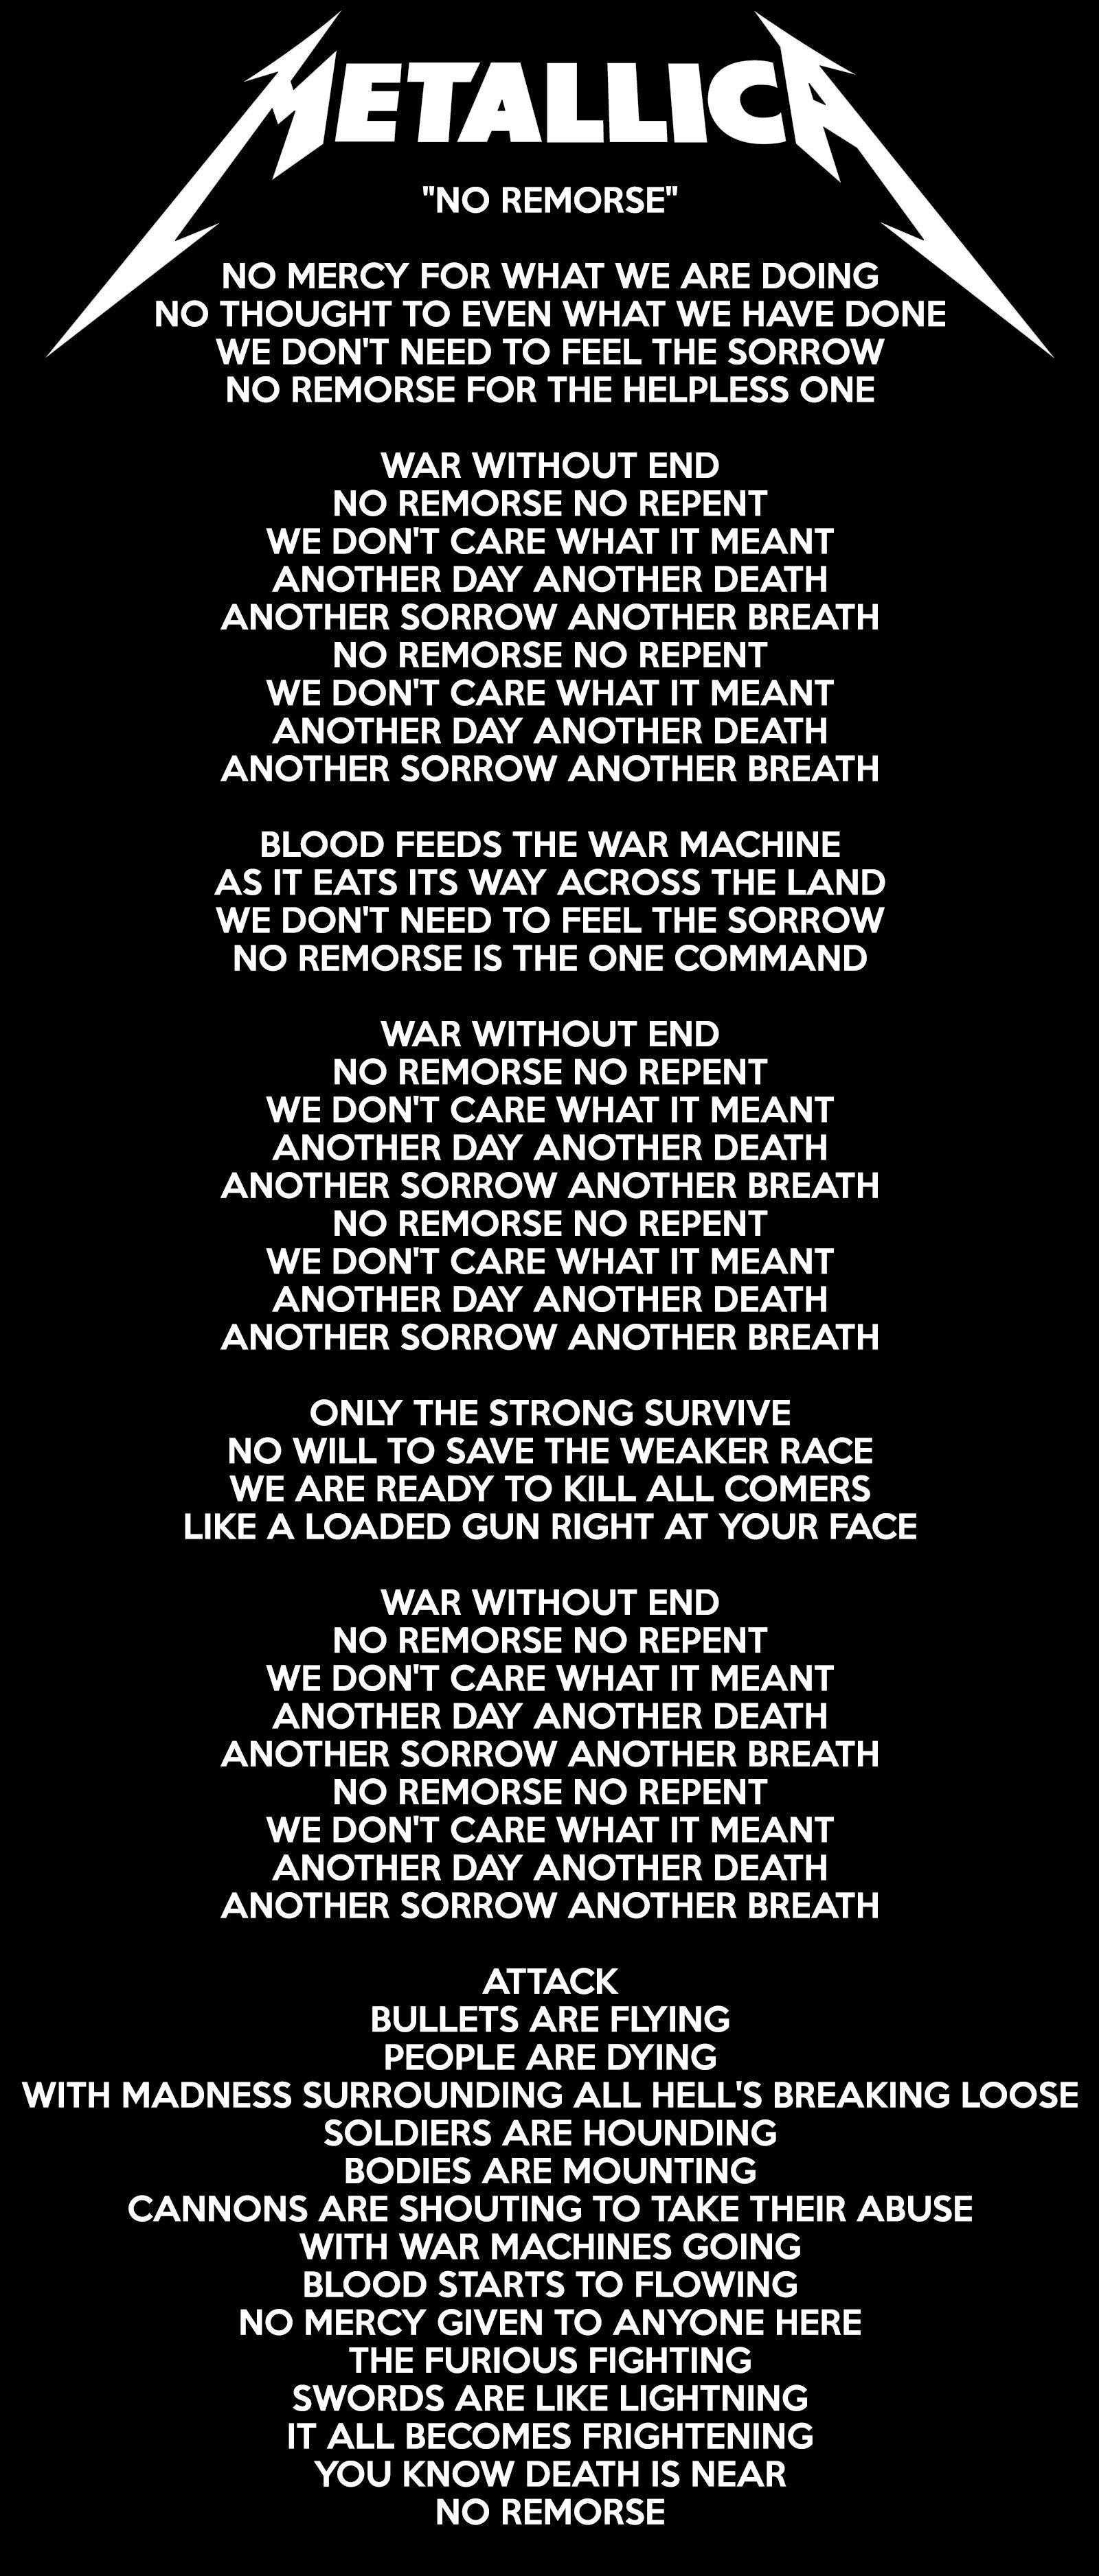 No Romorse Metallica Lyrics Metallica Lyrics Metallica Song Metallica Quotes